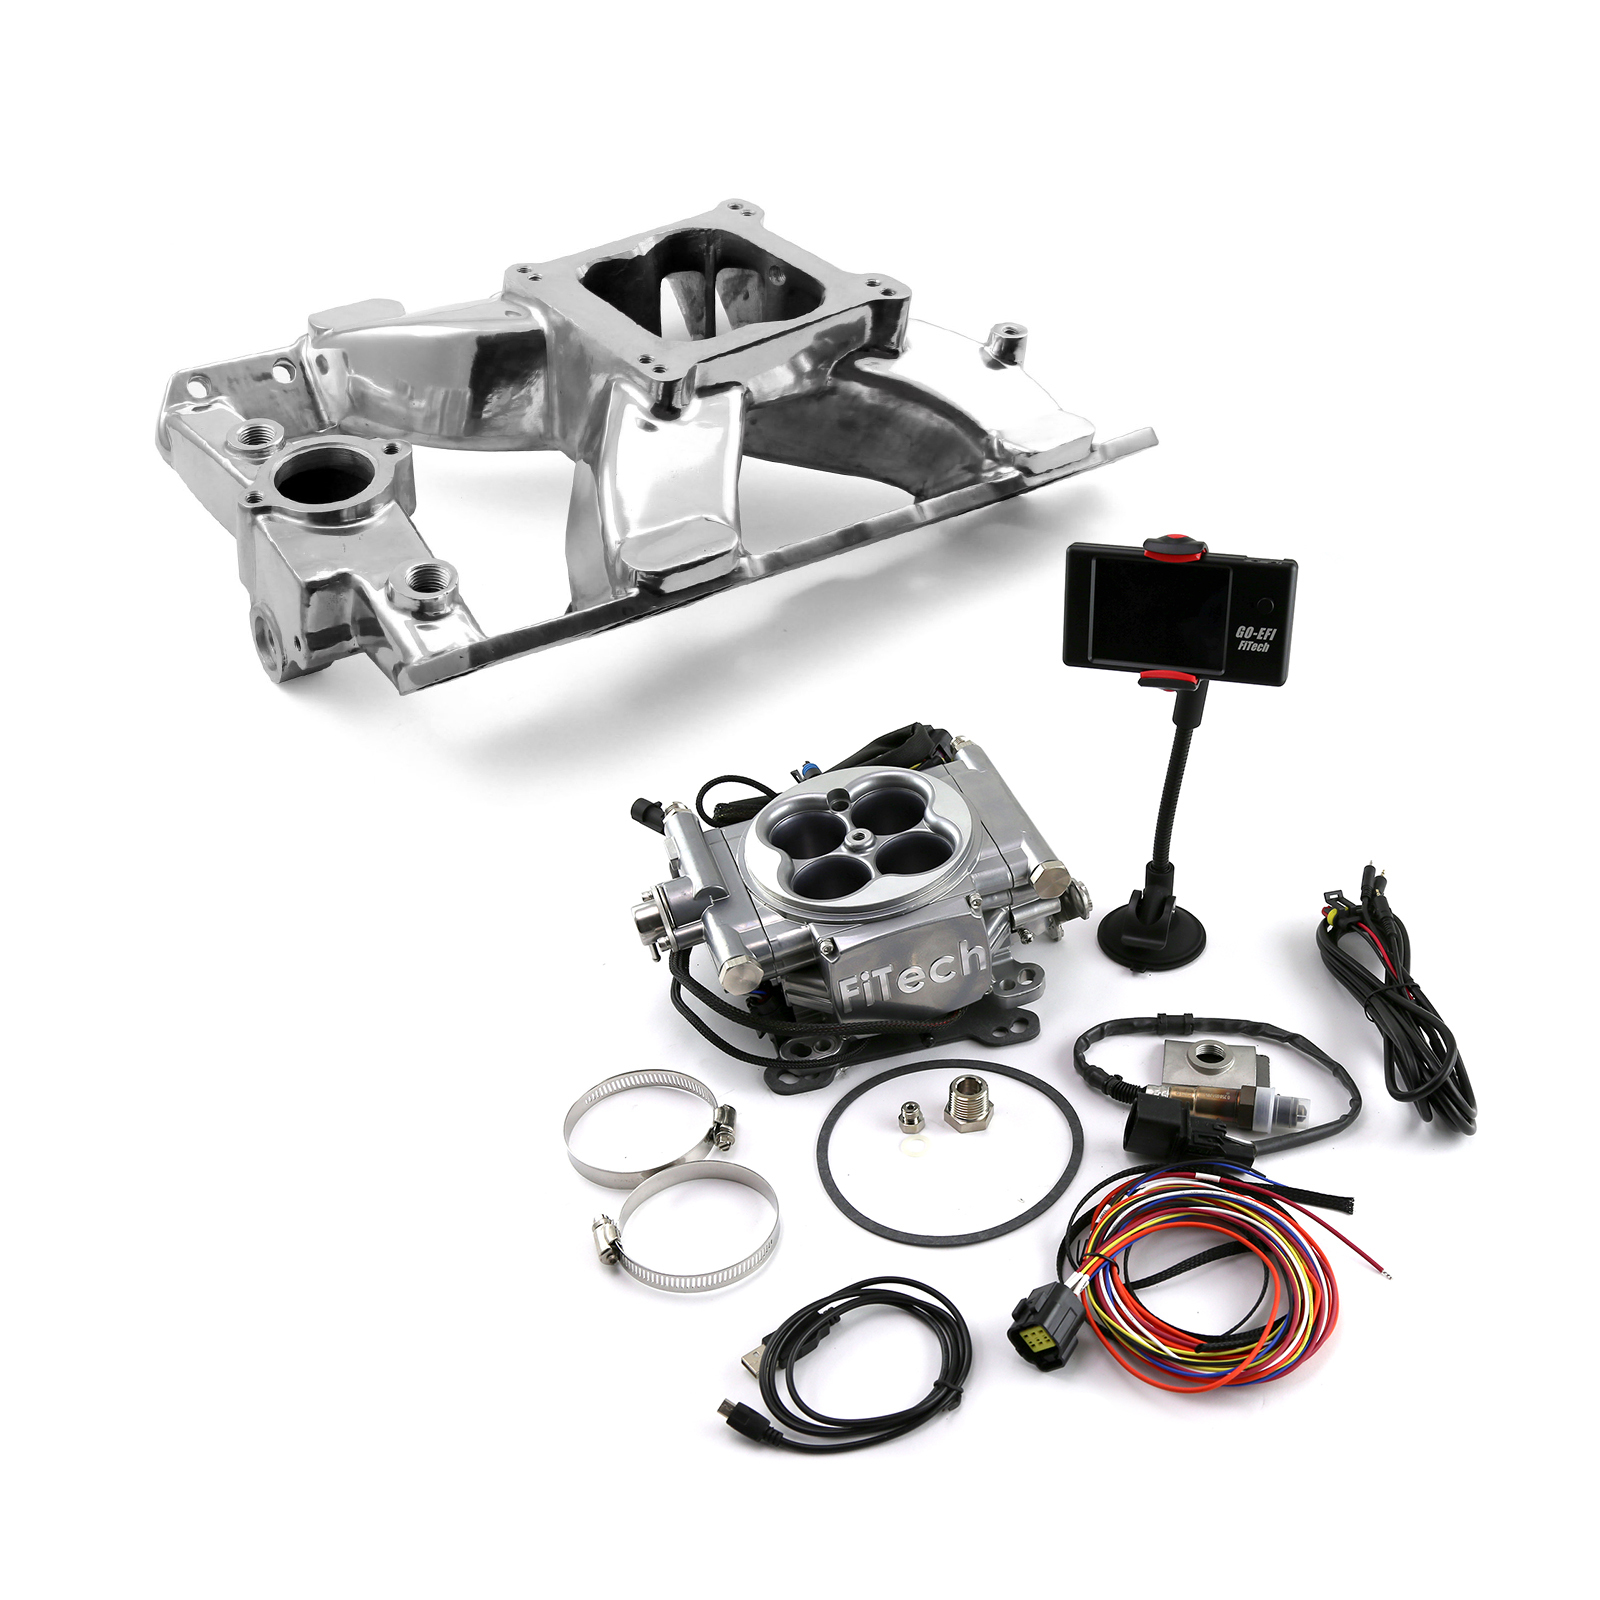 Pontiac V8 Shootout Manifold & FiTech Go EFI 30001 Fuel Injection